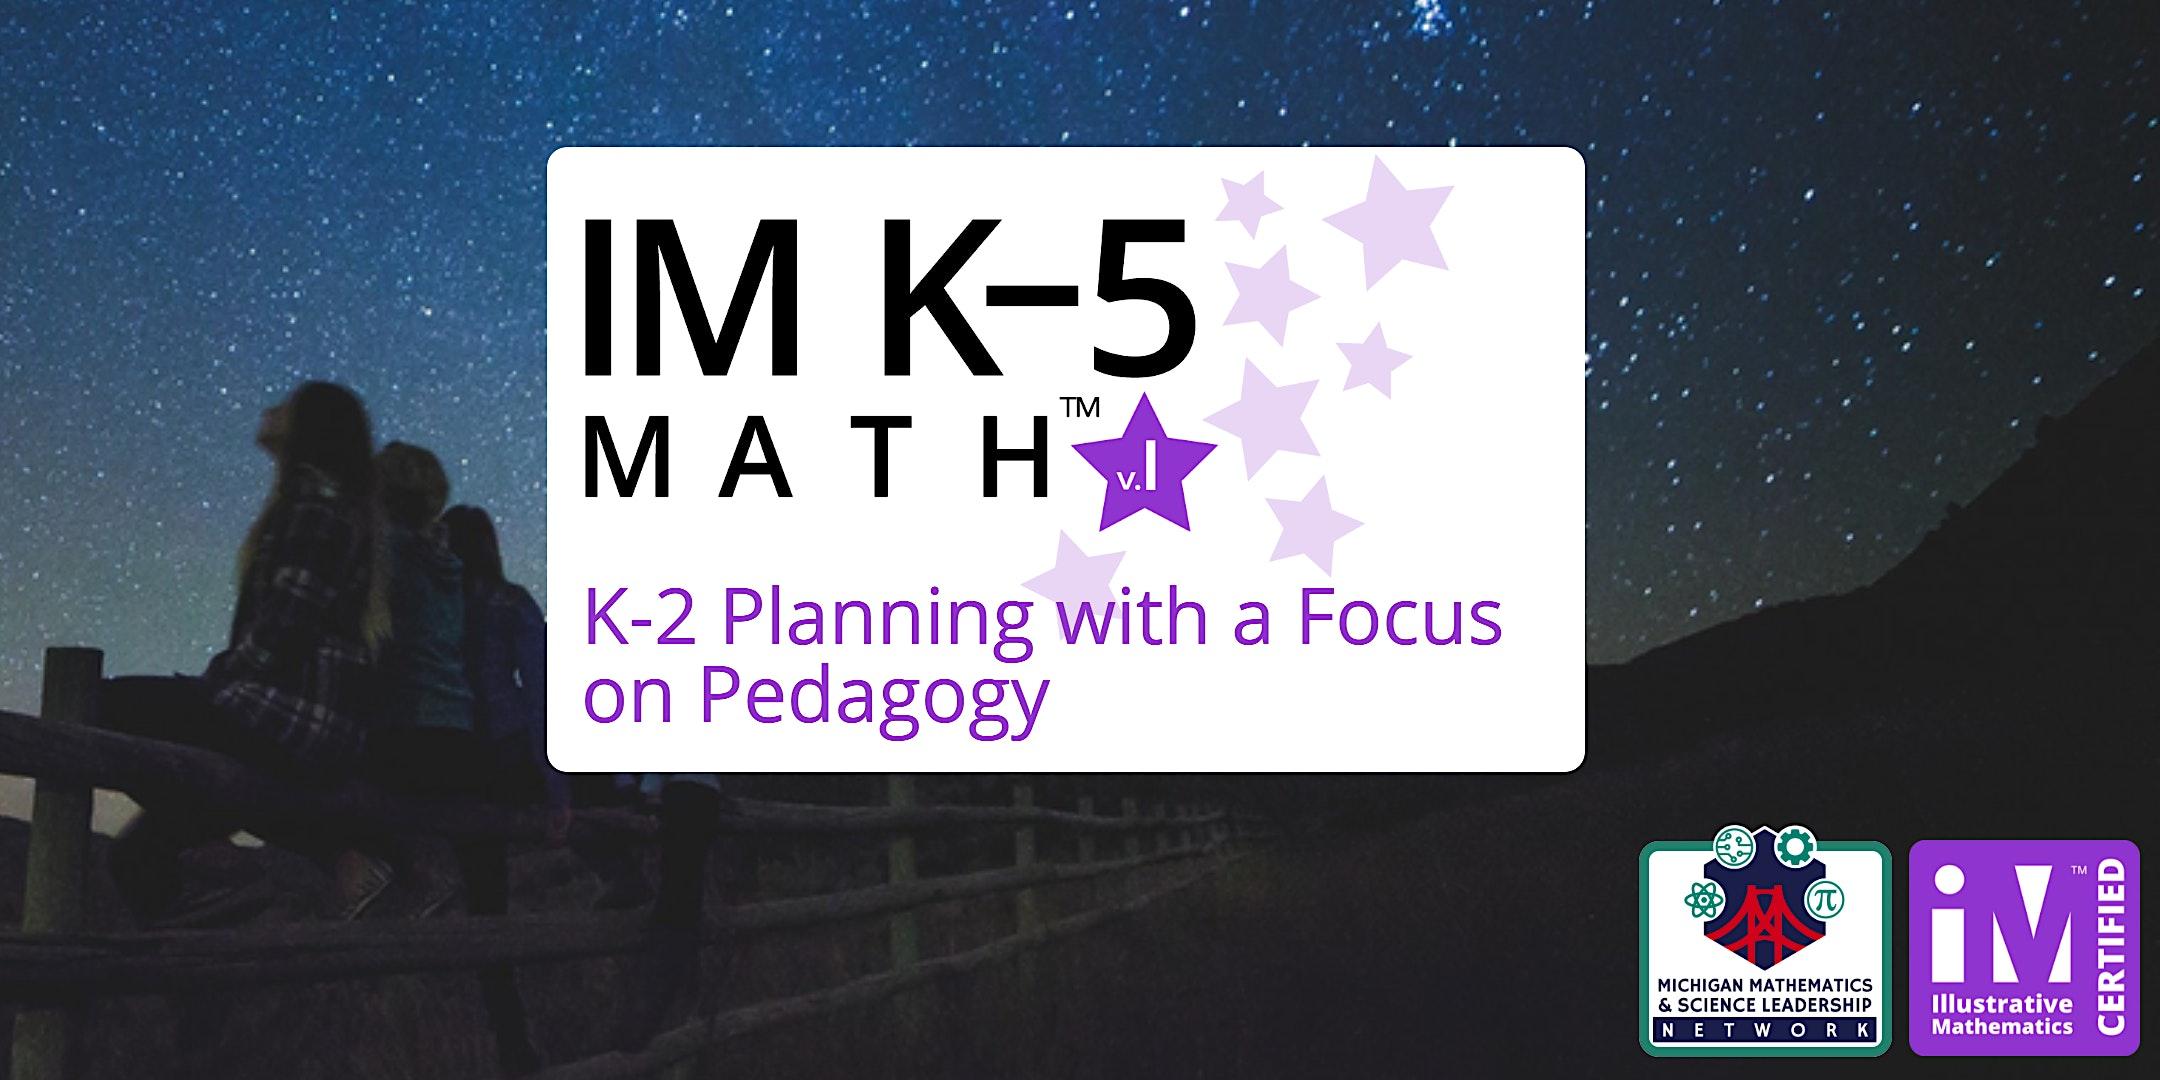 IM K-5 Math: K-2 Planning with a Focus on Pedagogy